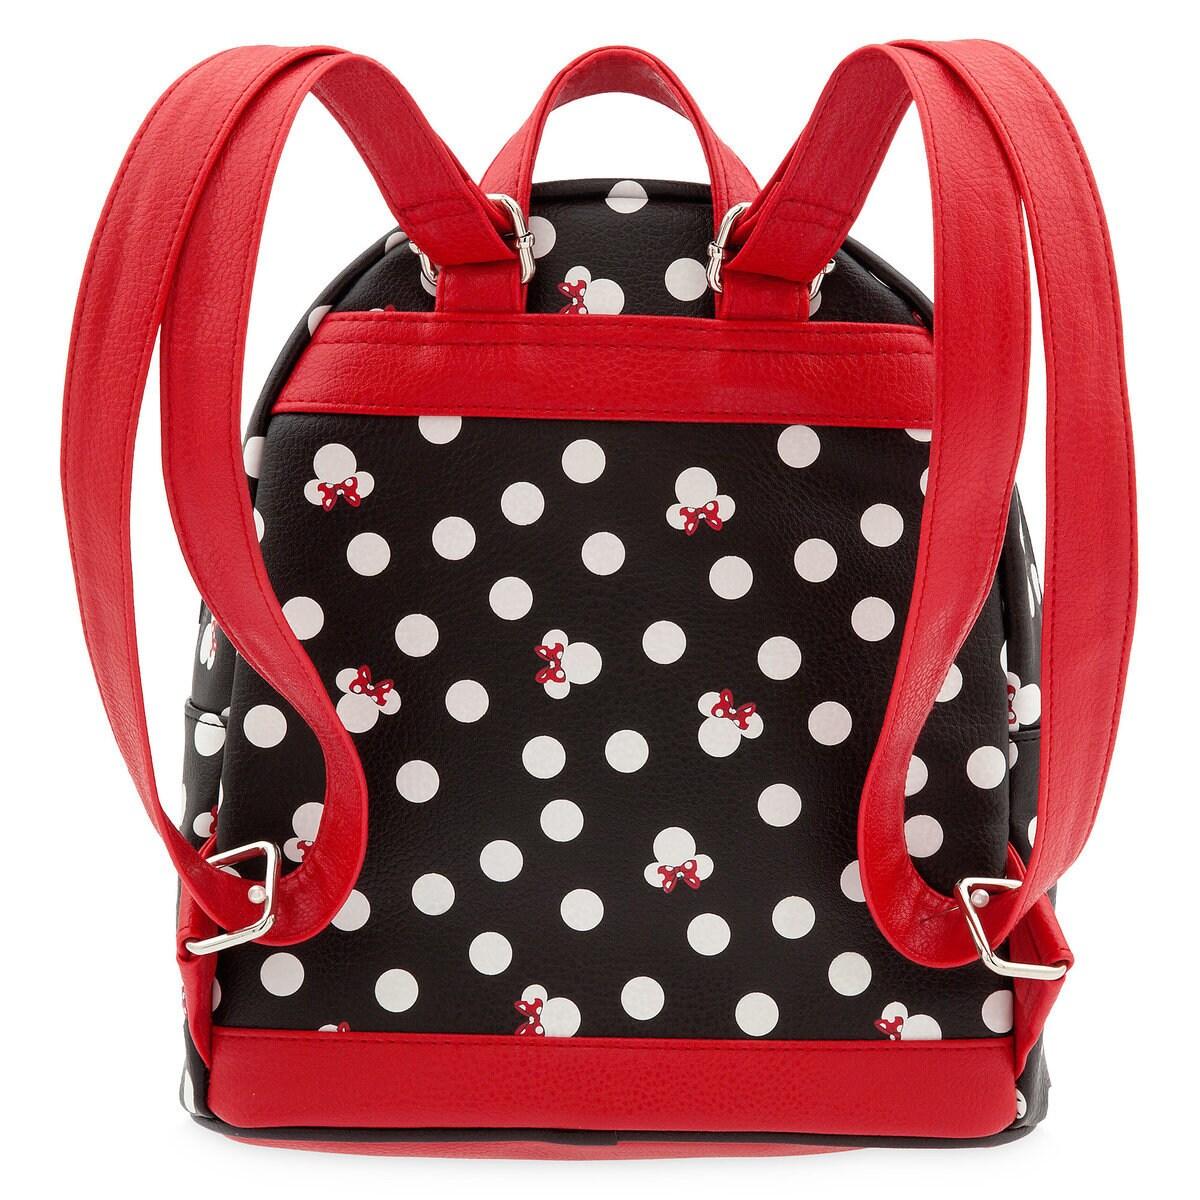 12342dc2f75d Minnie Mouse Mini Backpack - Adults